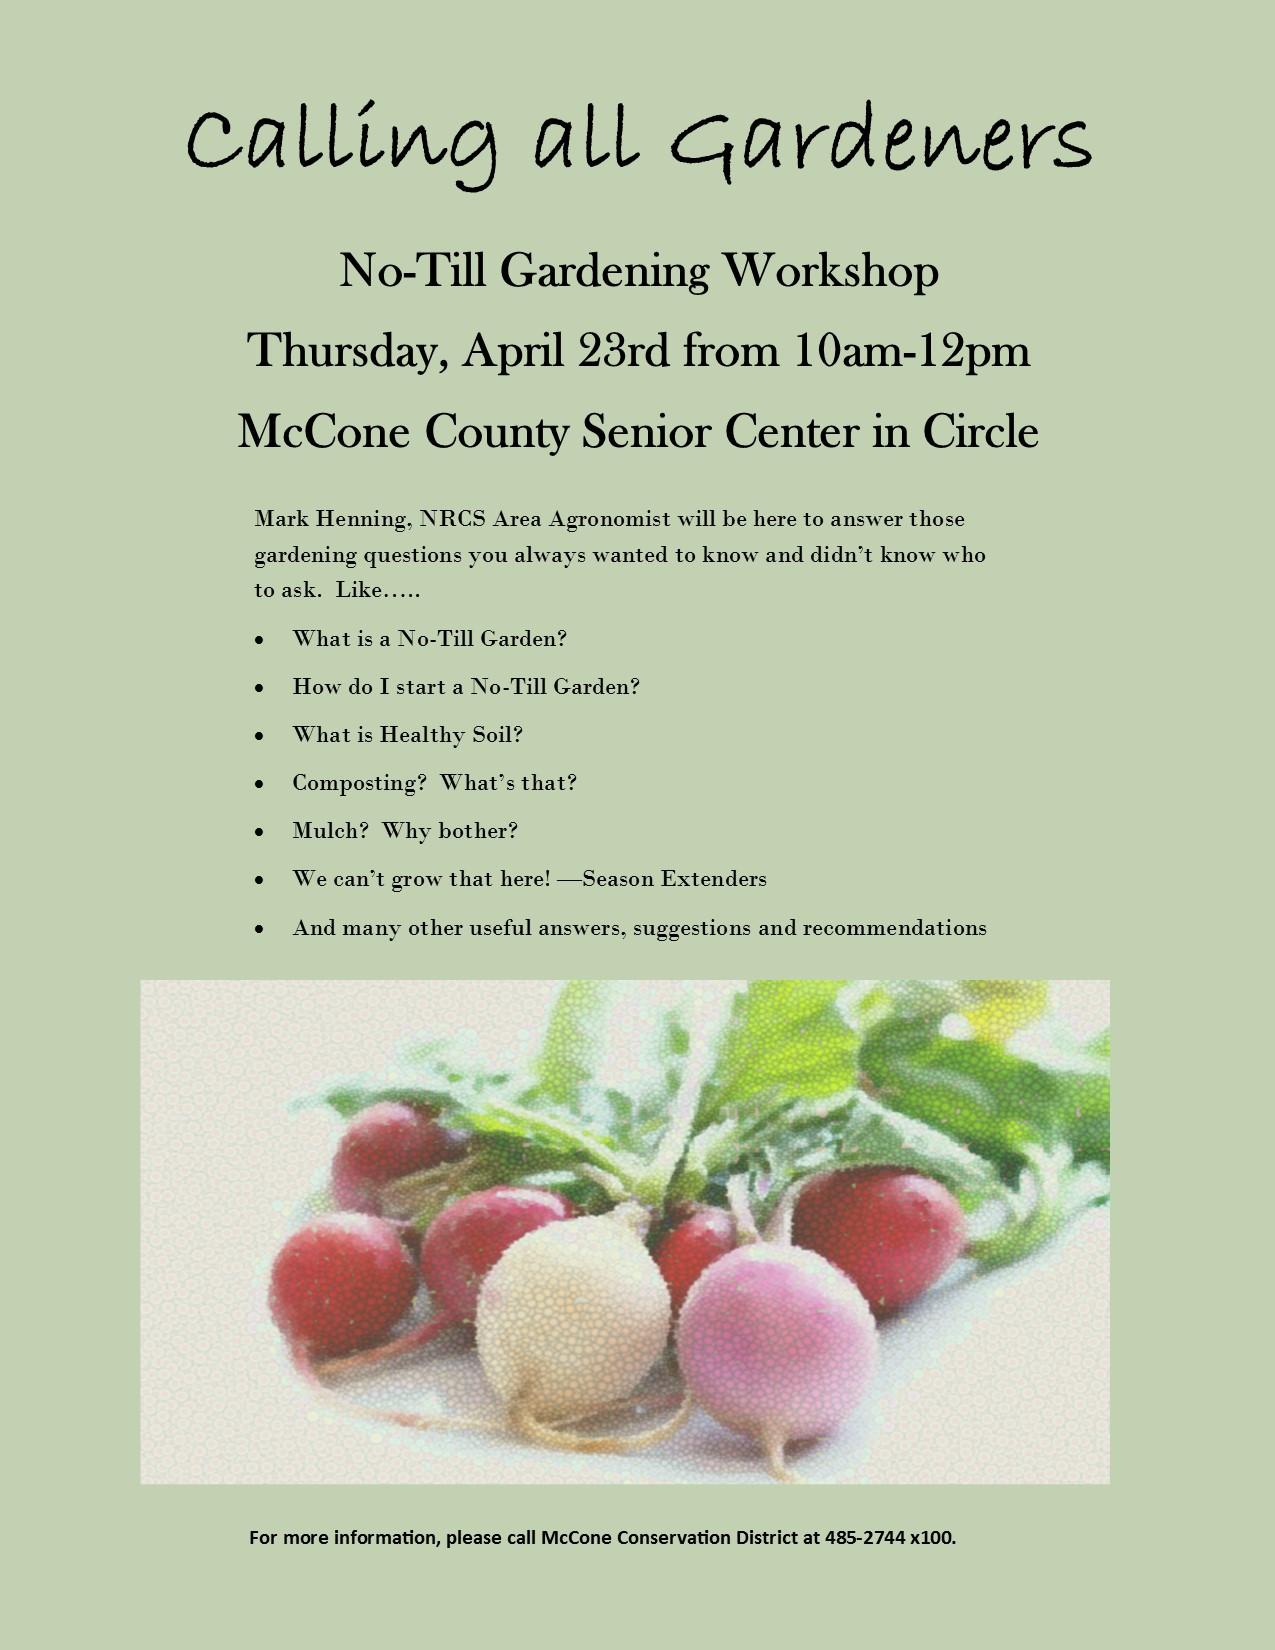 Montana mccone county circle - No Till Gardening Workshop